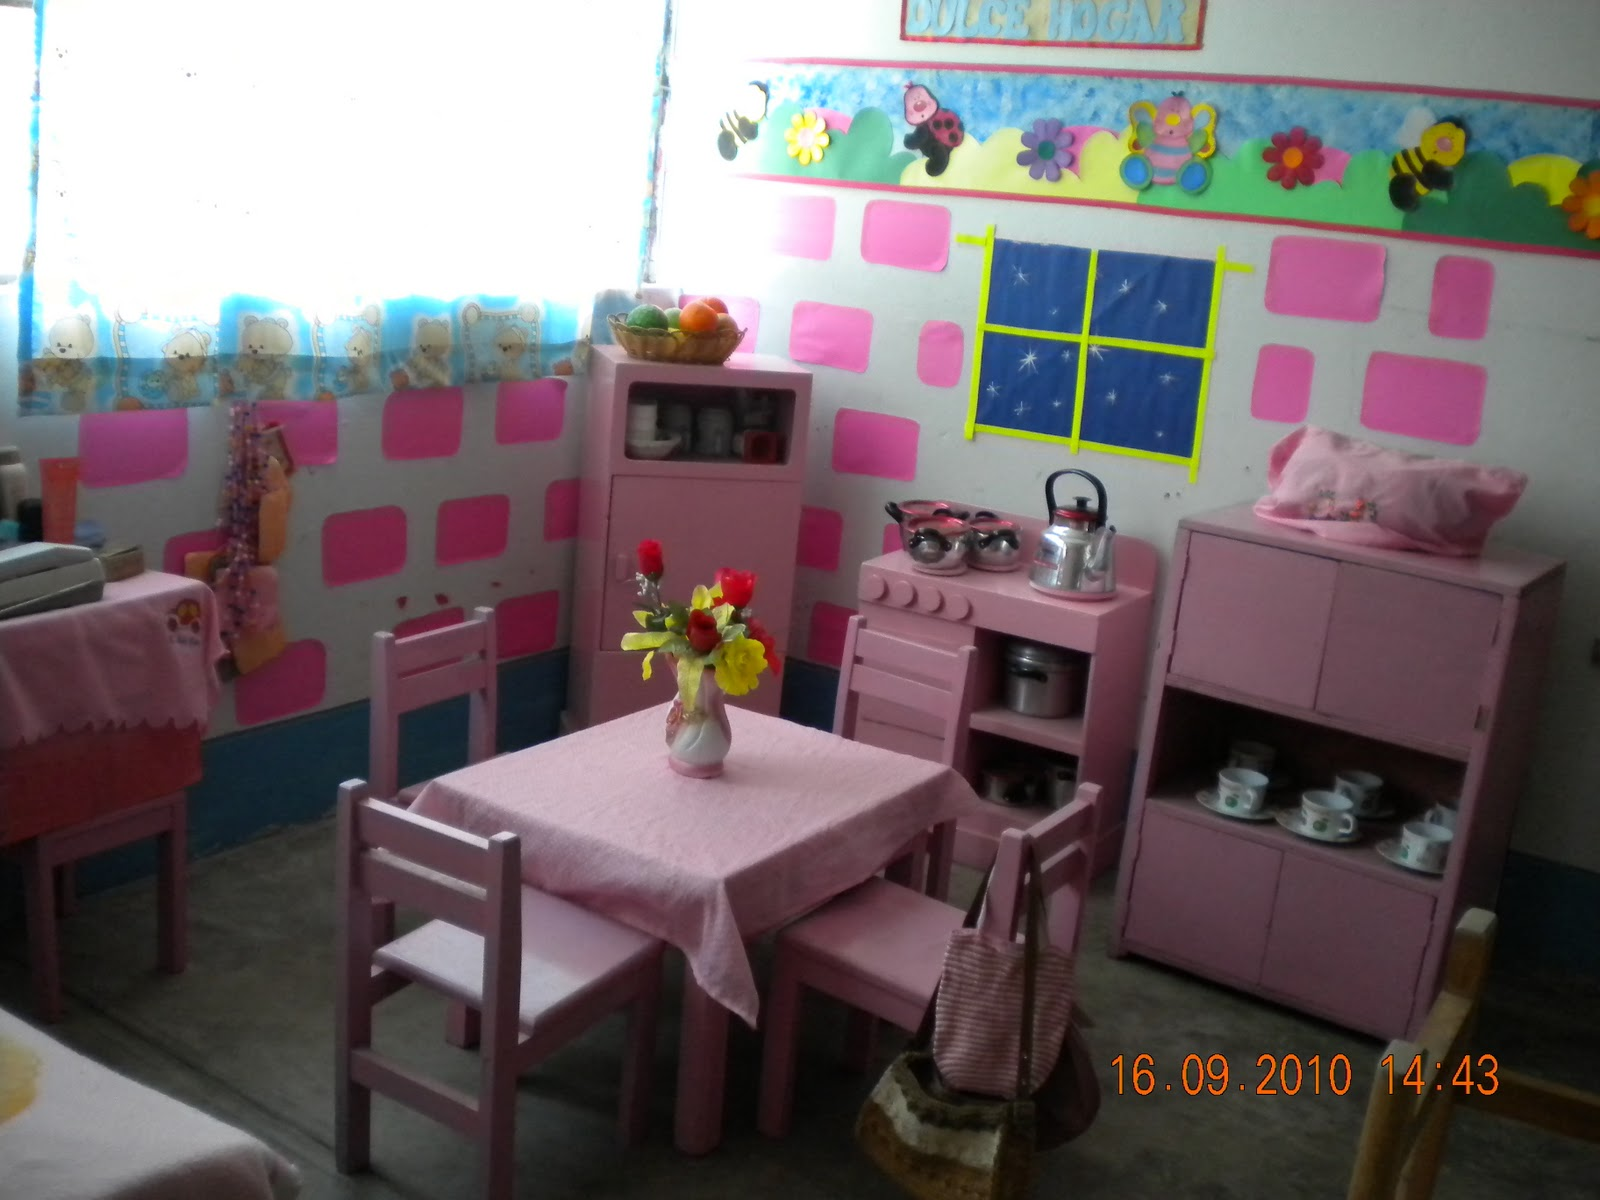 Cuna jardin n 630 juan pablo ii ambientaci n del aula for Que es decoracion del hogar